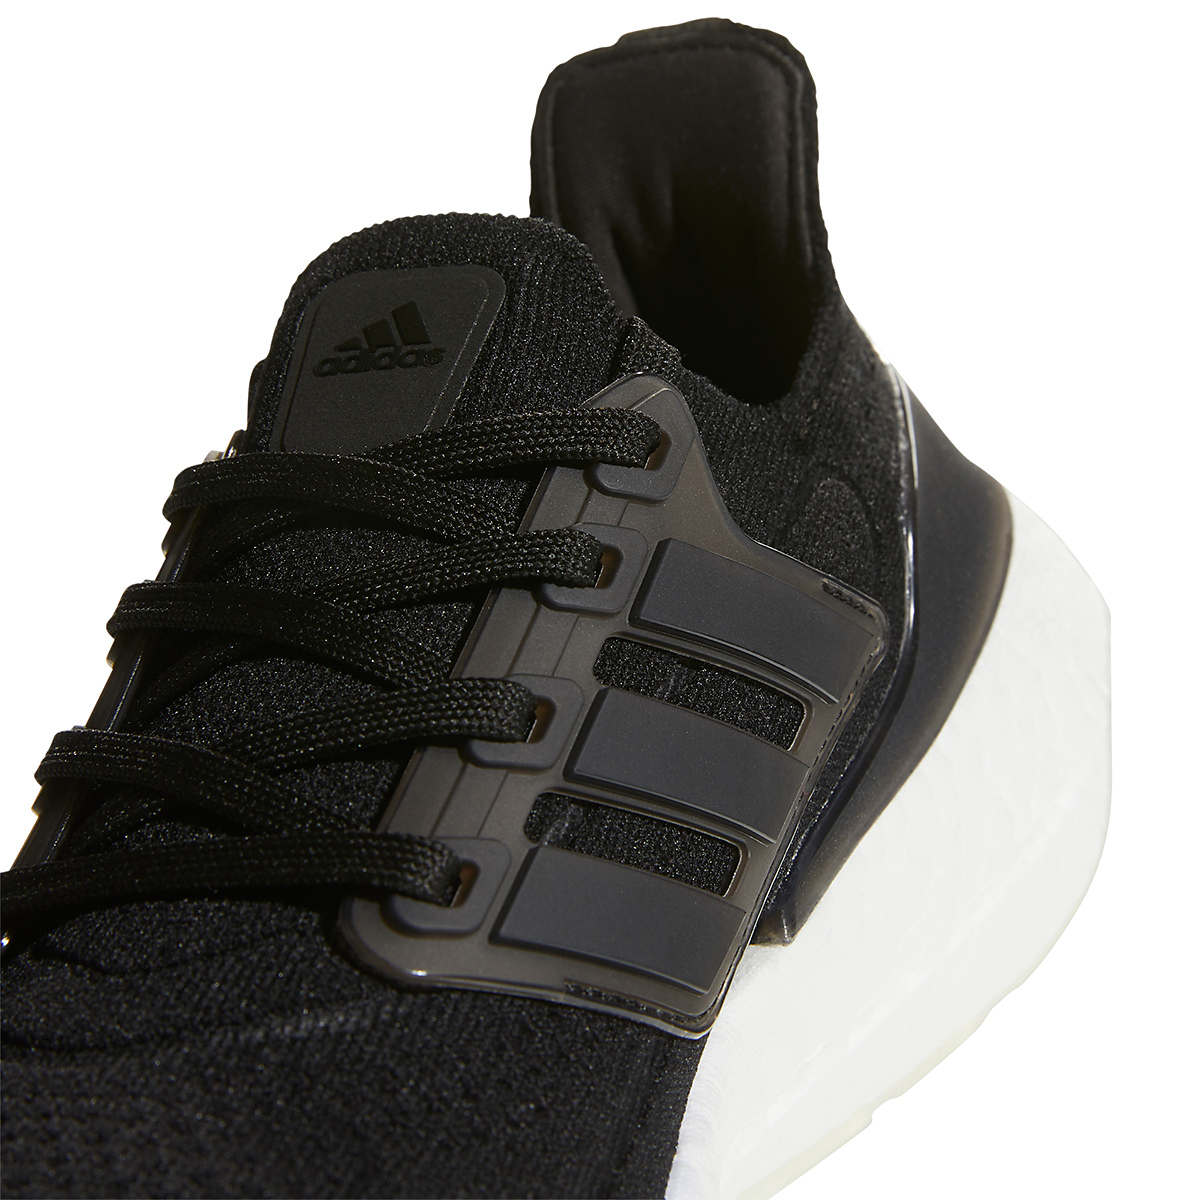 Women's Adidas Ultraboost 21 Running Shoe - Color: Core Black/Grey - Size: 5 - Width: Regular, Core Black/Grey, large, image 4